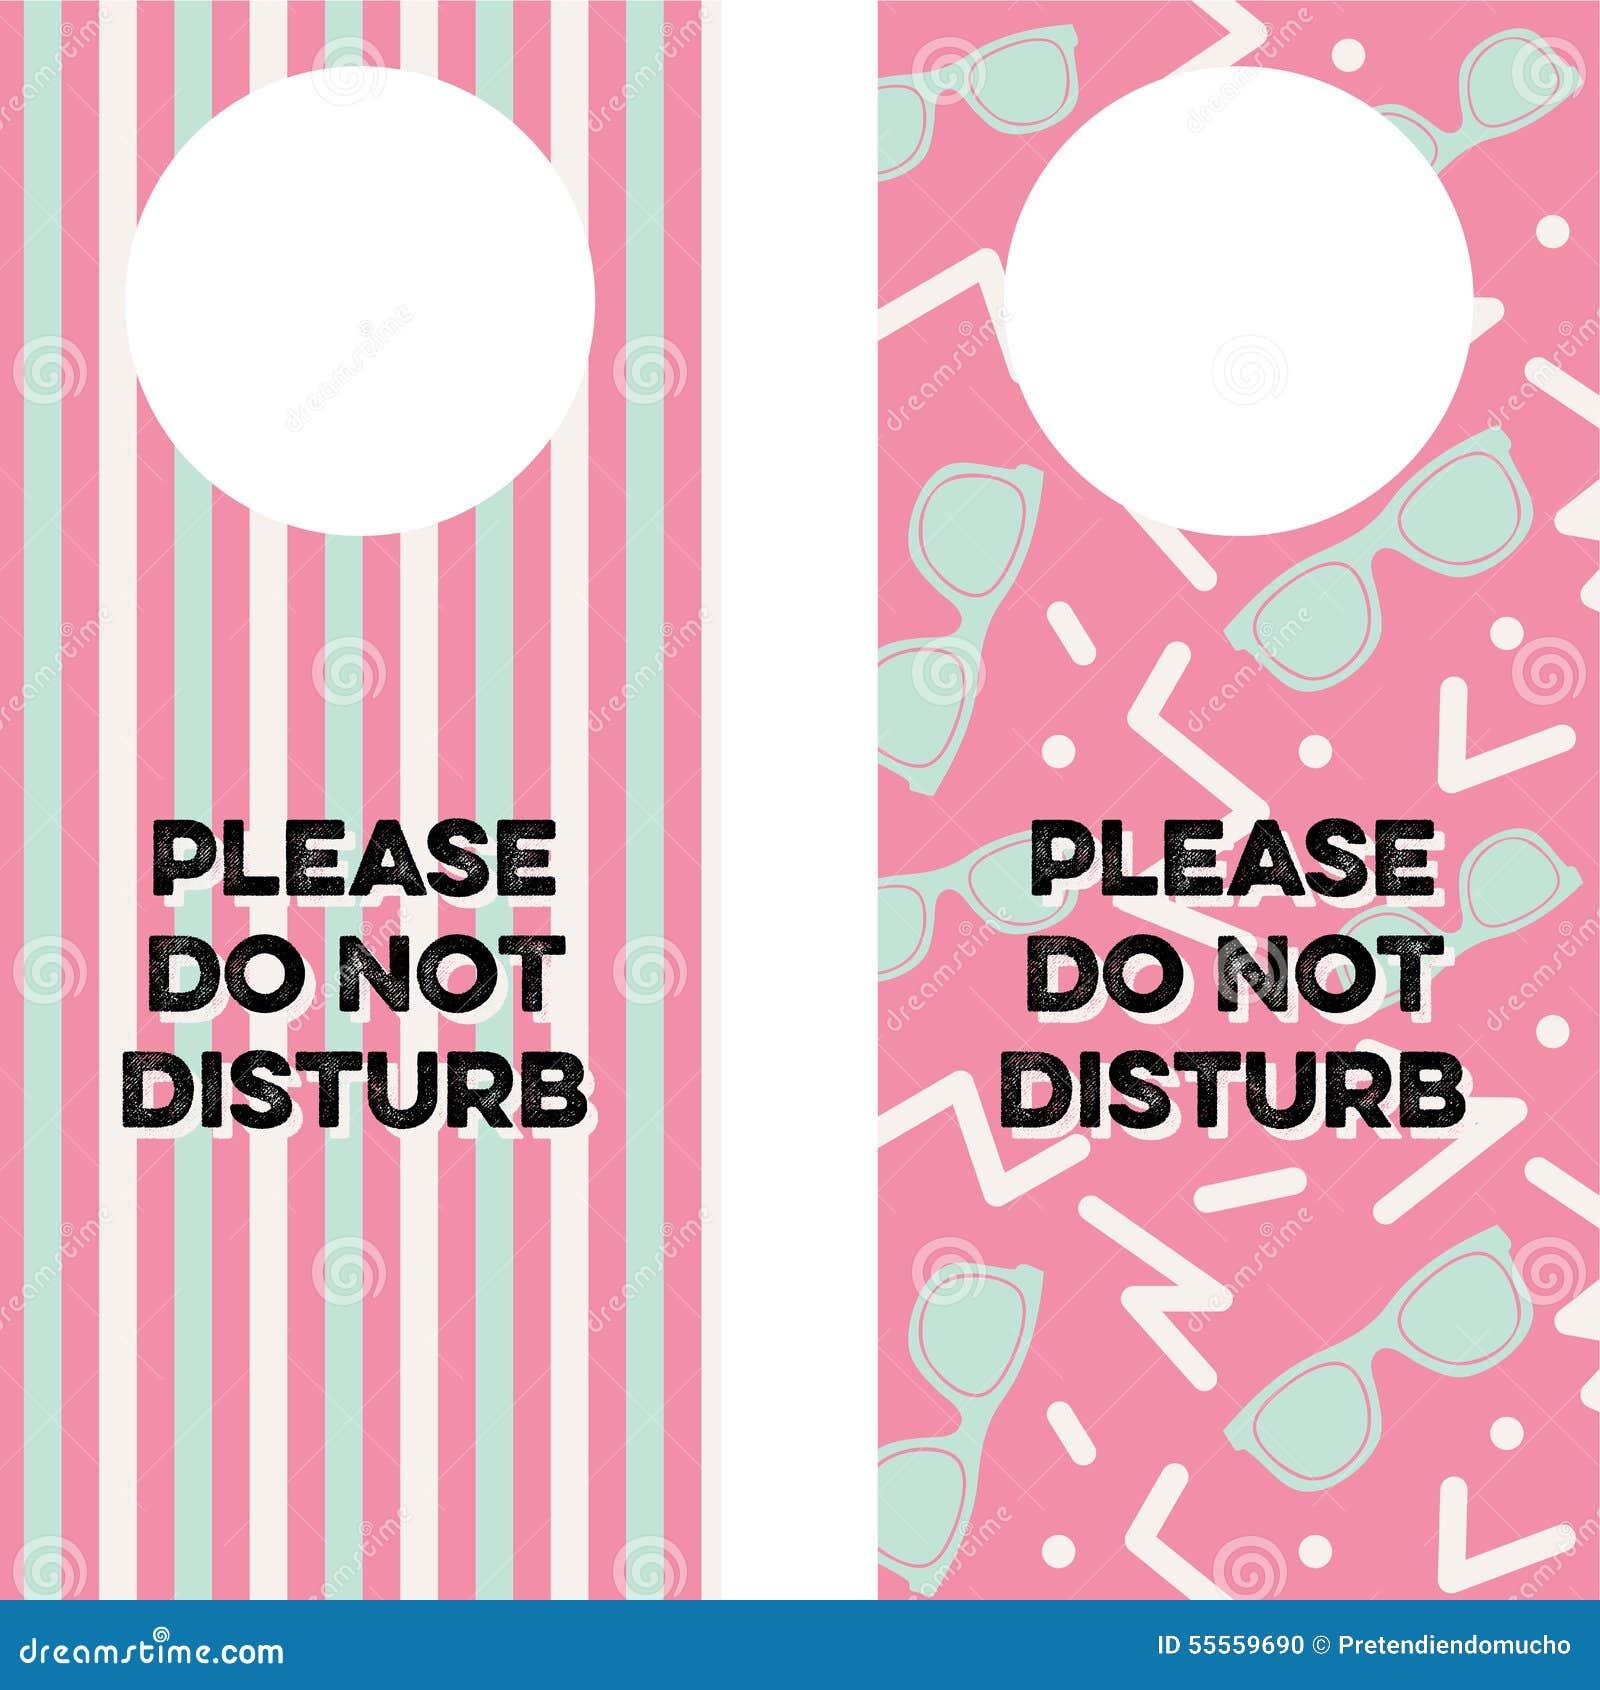 printable do not disturb sign